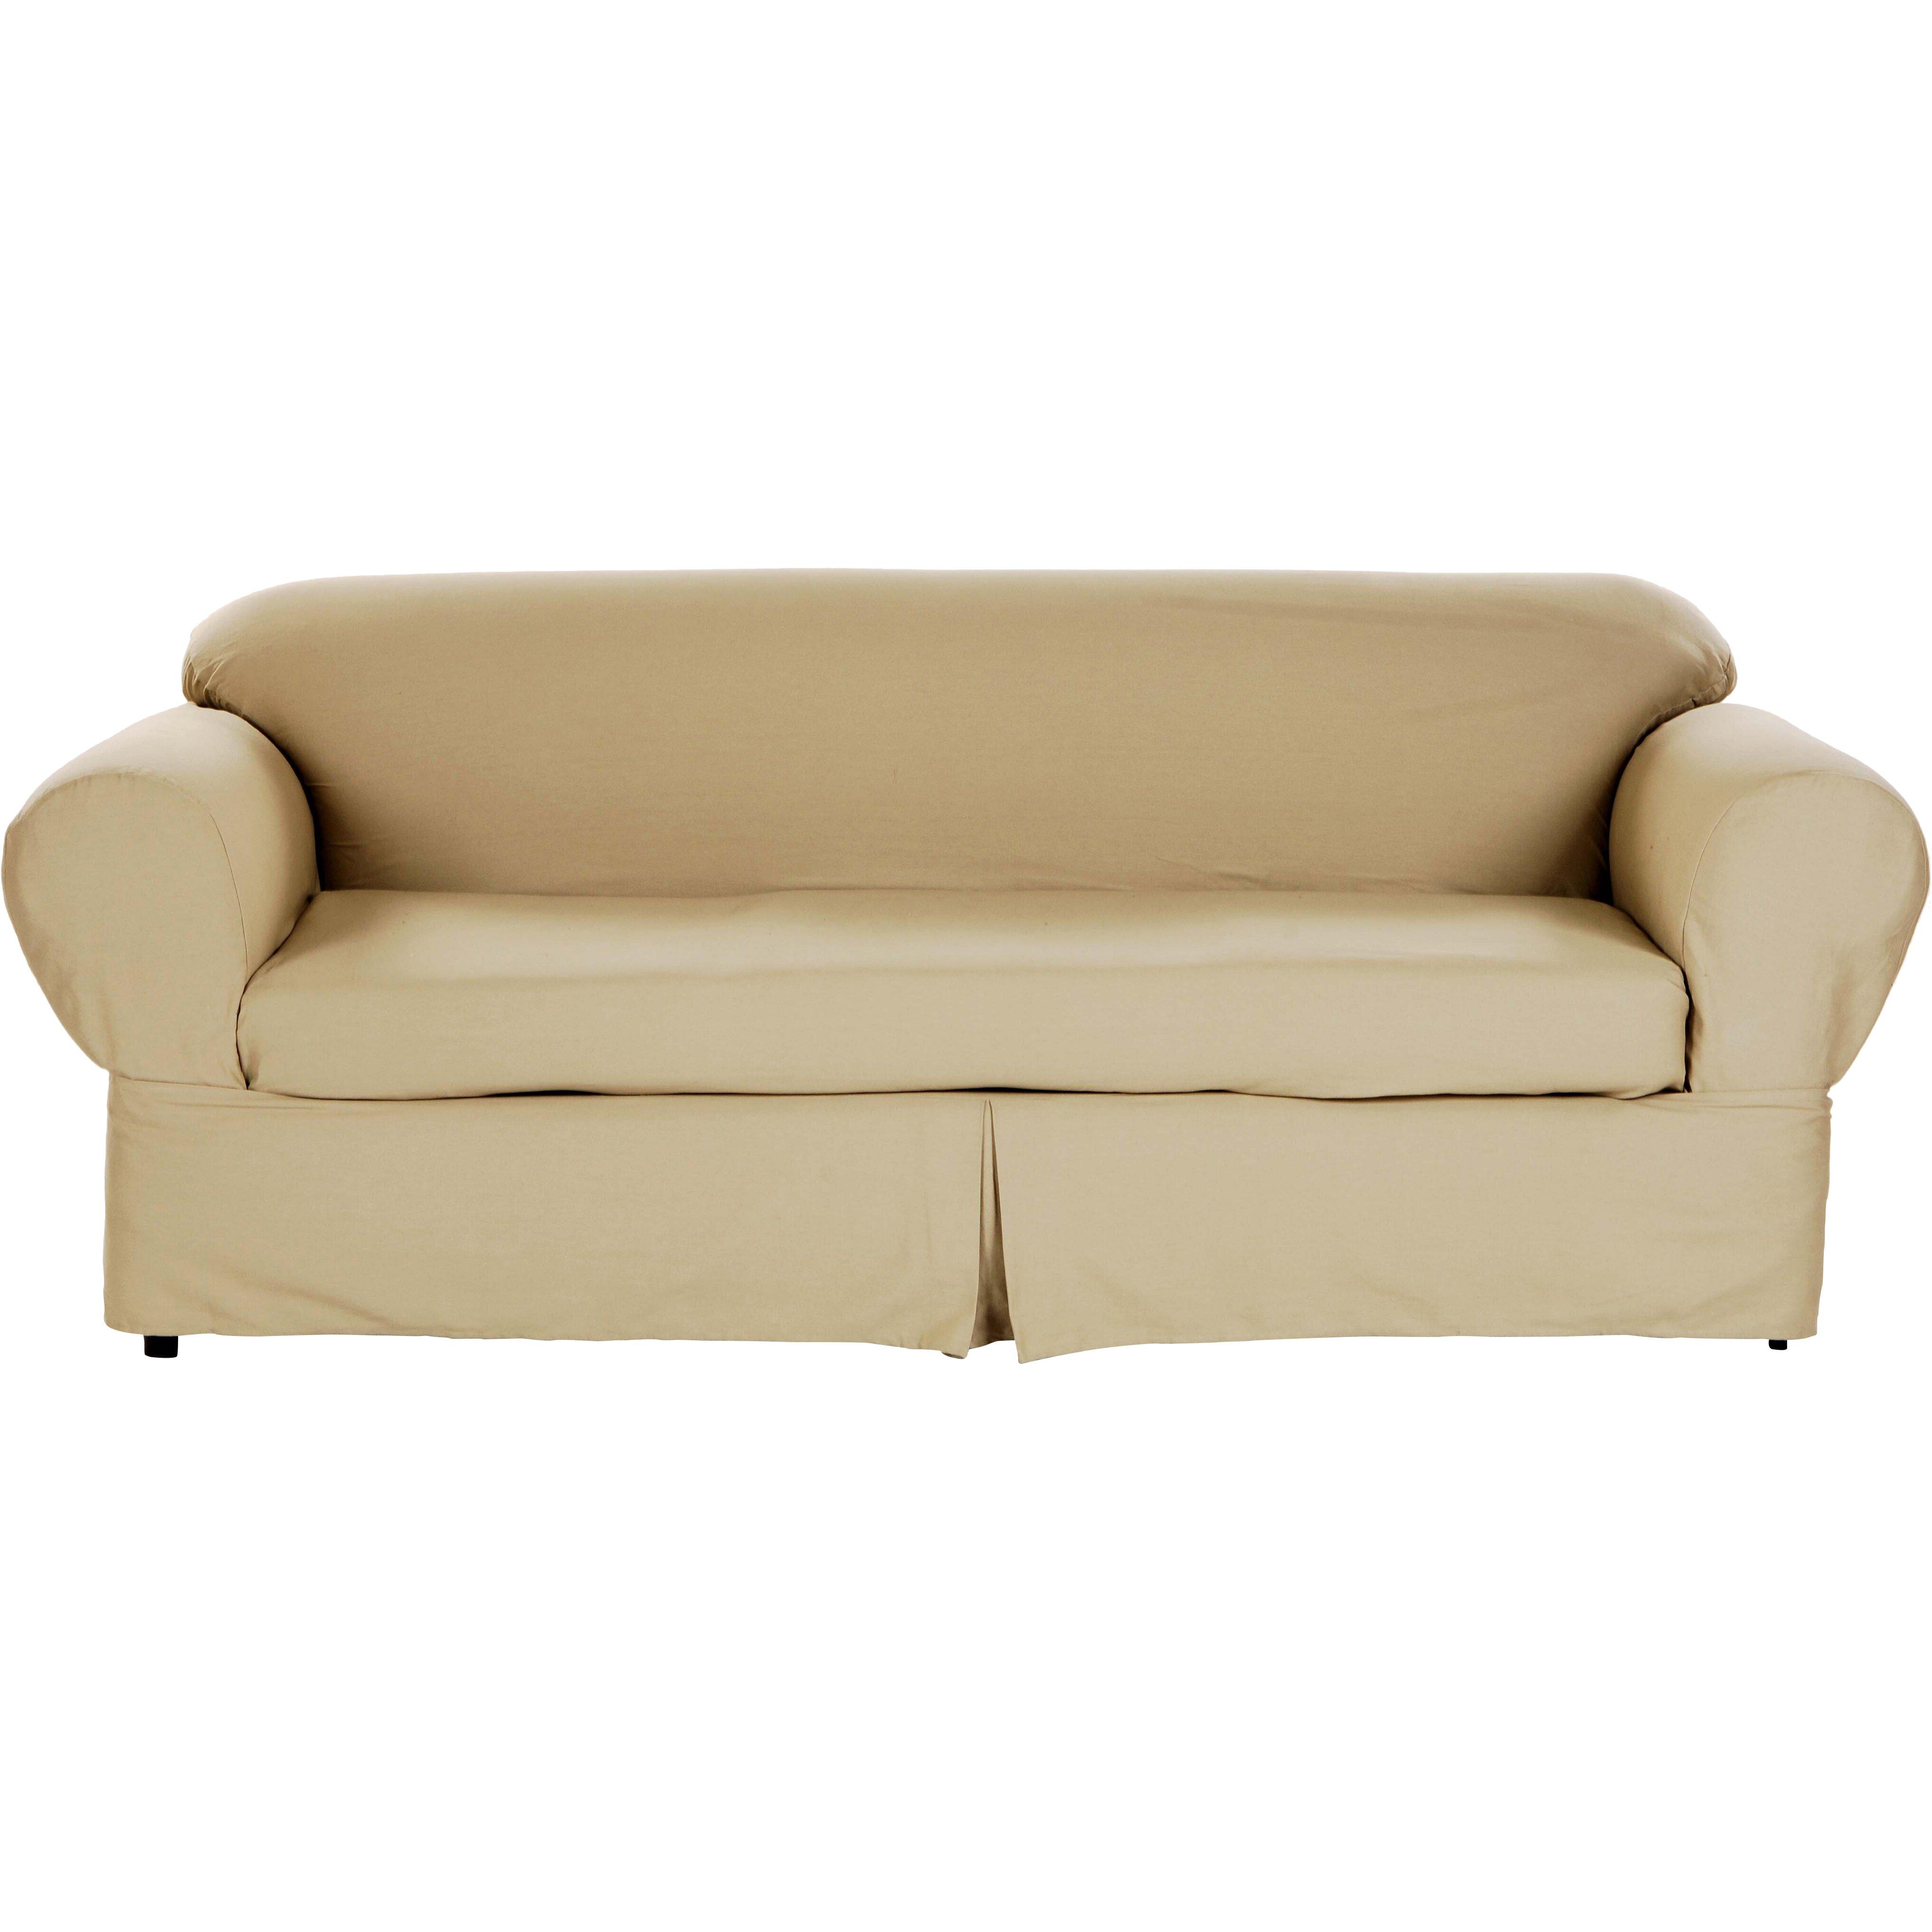 Darby Home Co Sofa Slipcover Reviews